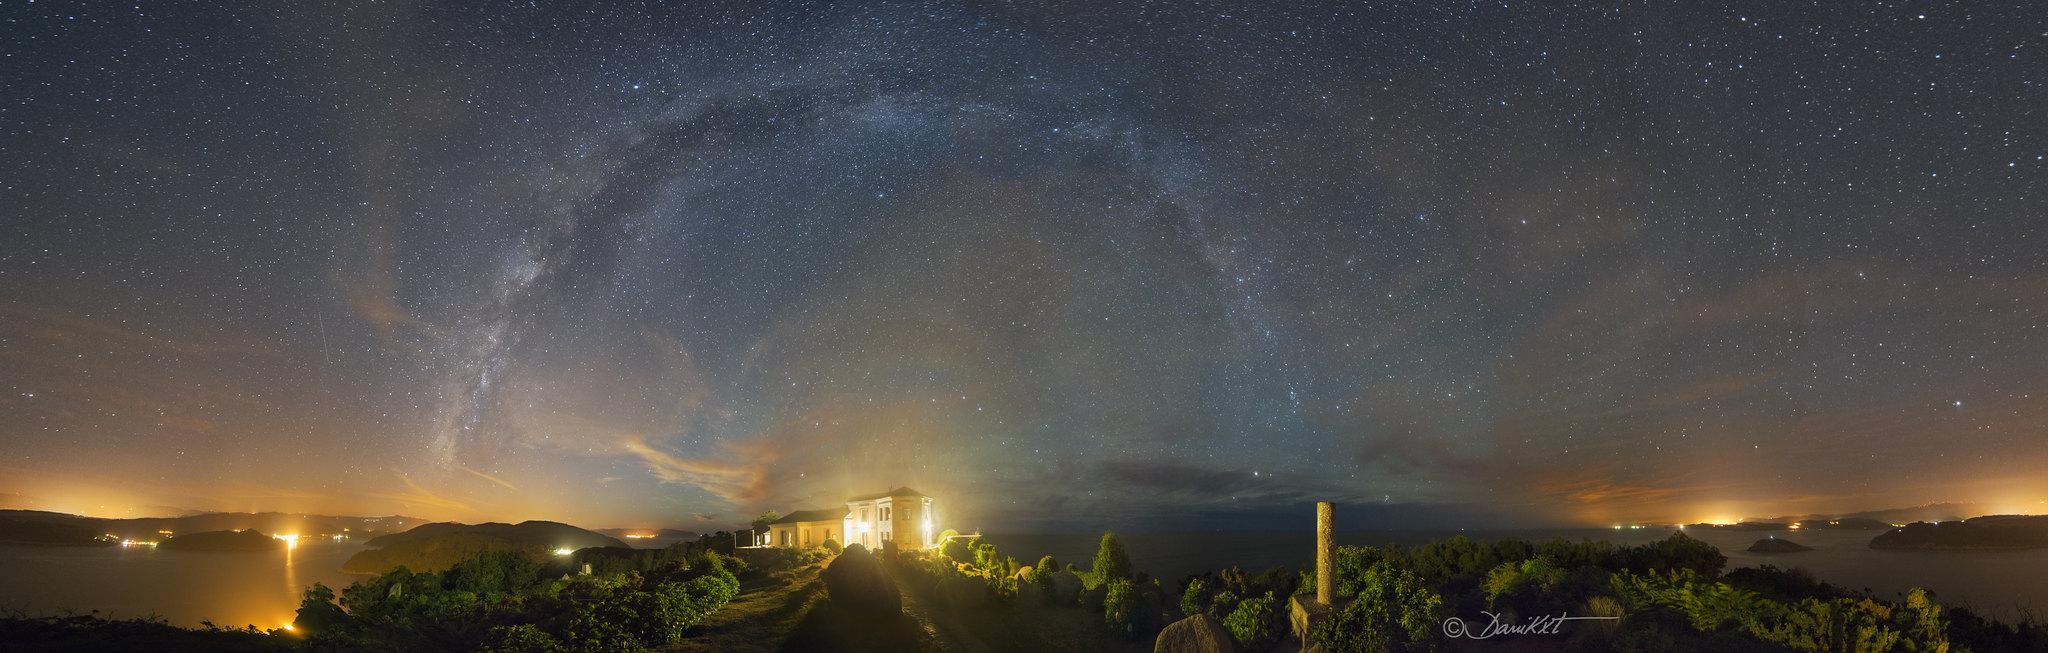 Panorámica Vía Láctea del Semáforo de Bares fotografia Dani Caxete